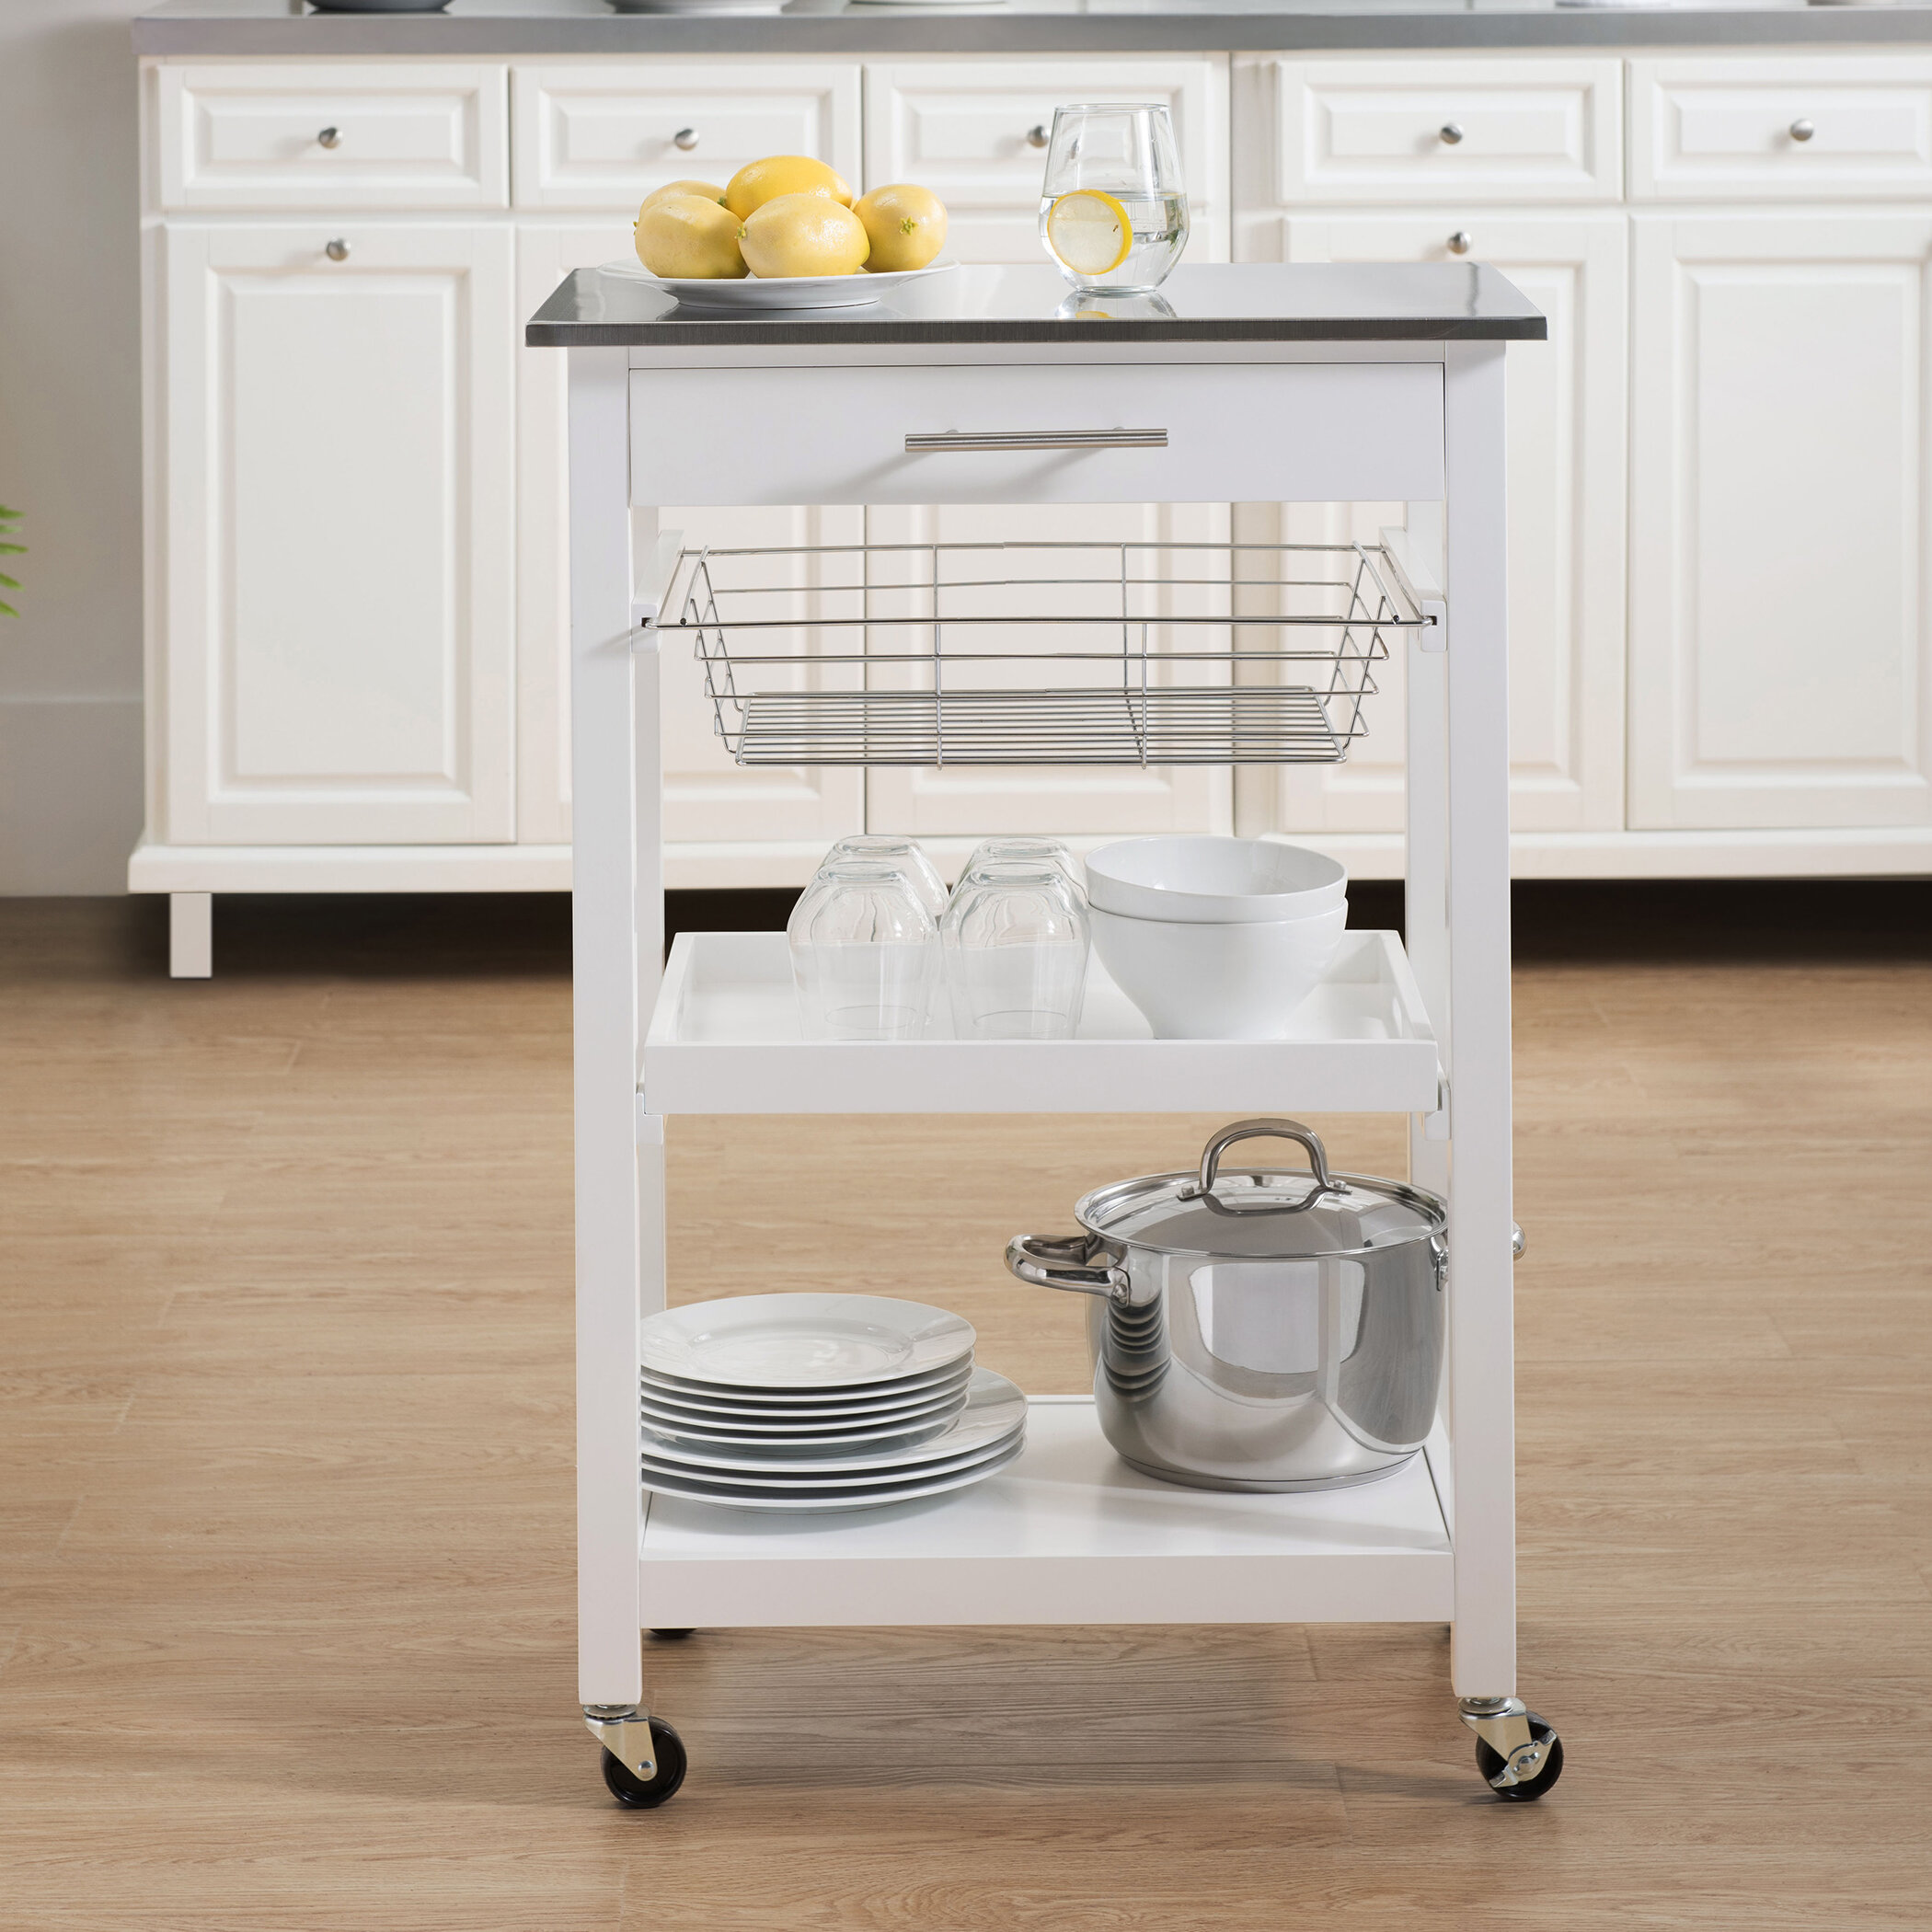 Highland dunes edolie kitchen cart reviews wayfair